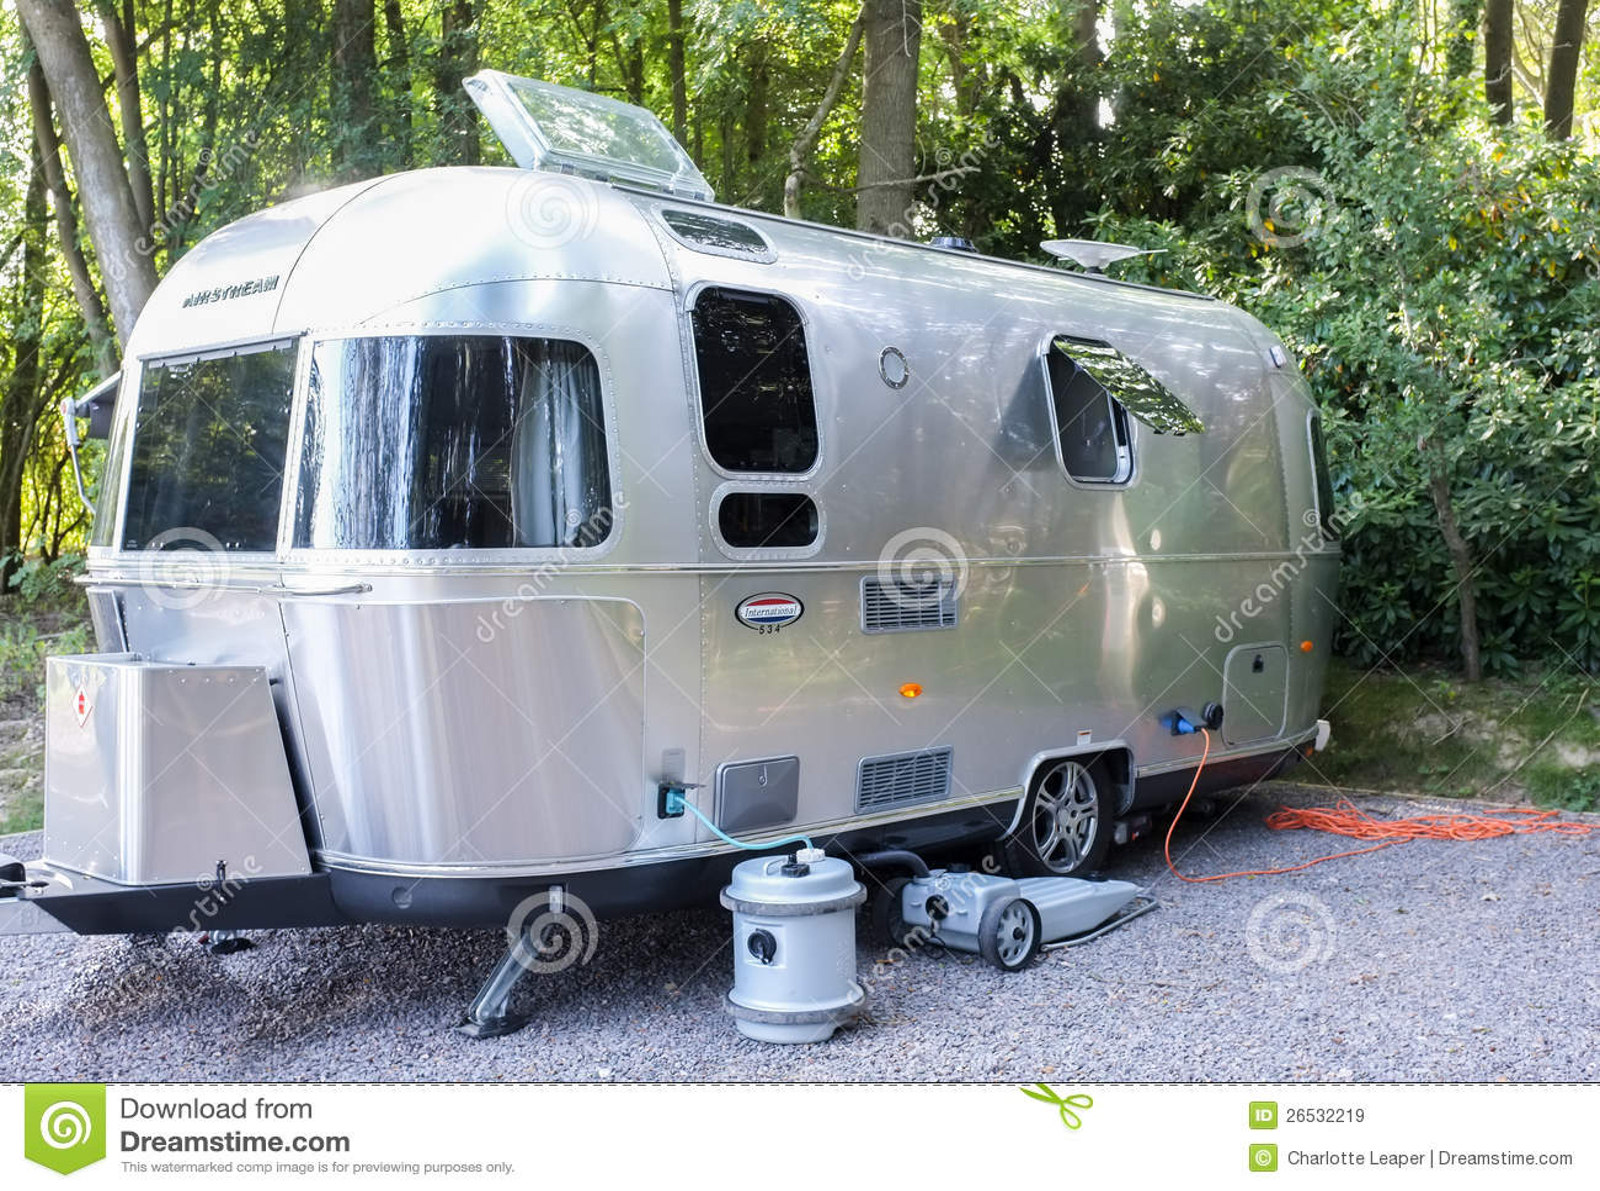 vintage airstream trailer on campsite editorial stock image image 26532219. Black Bedroom Furniture Sets. Home Design Ideas